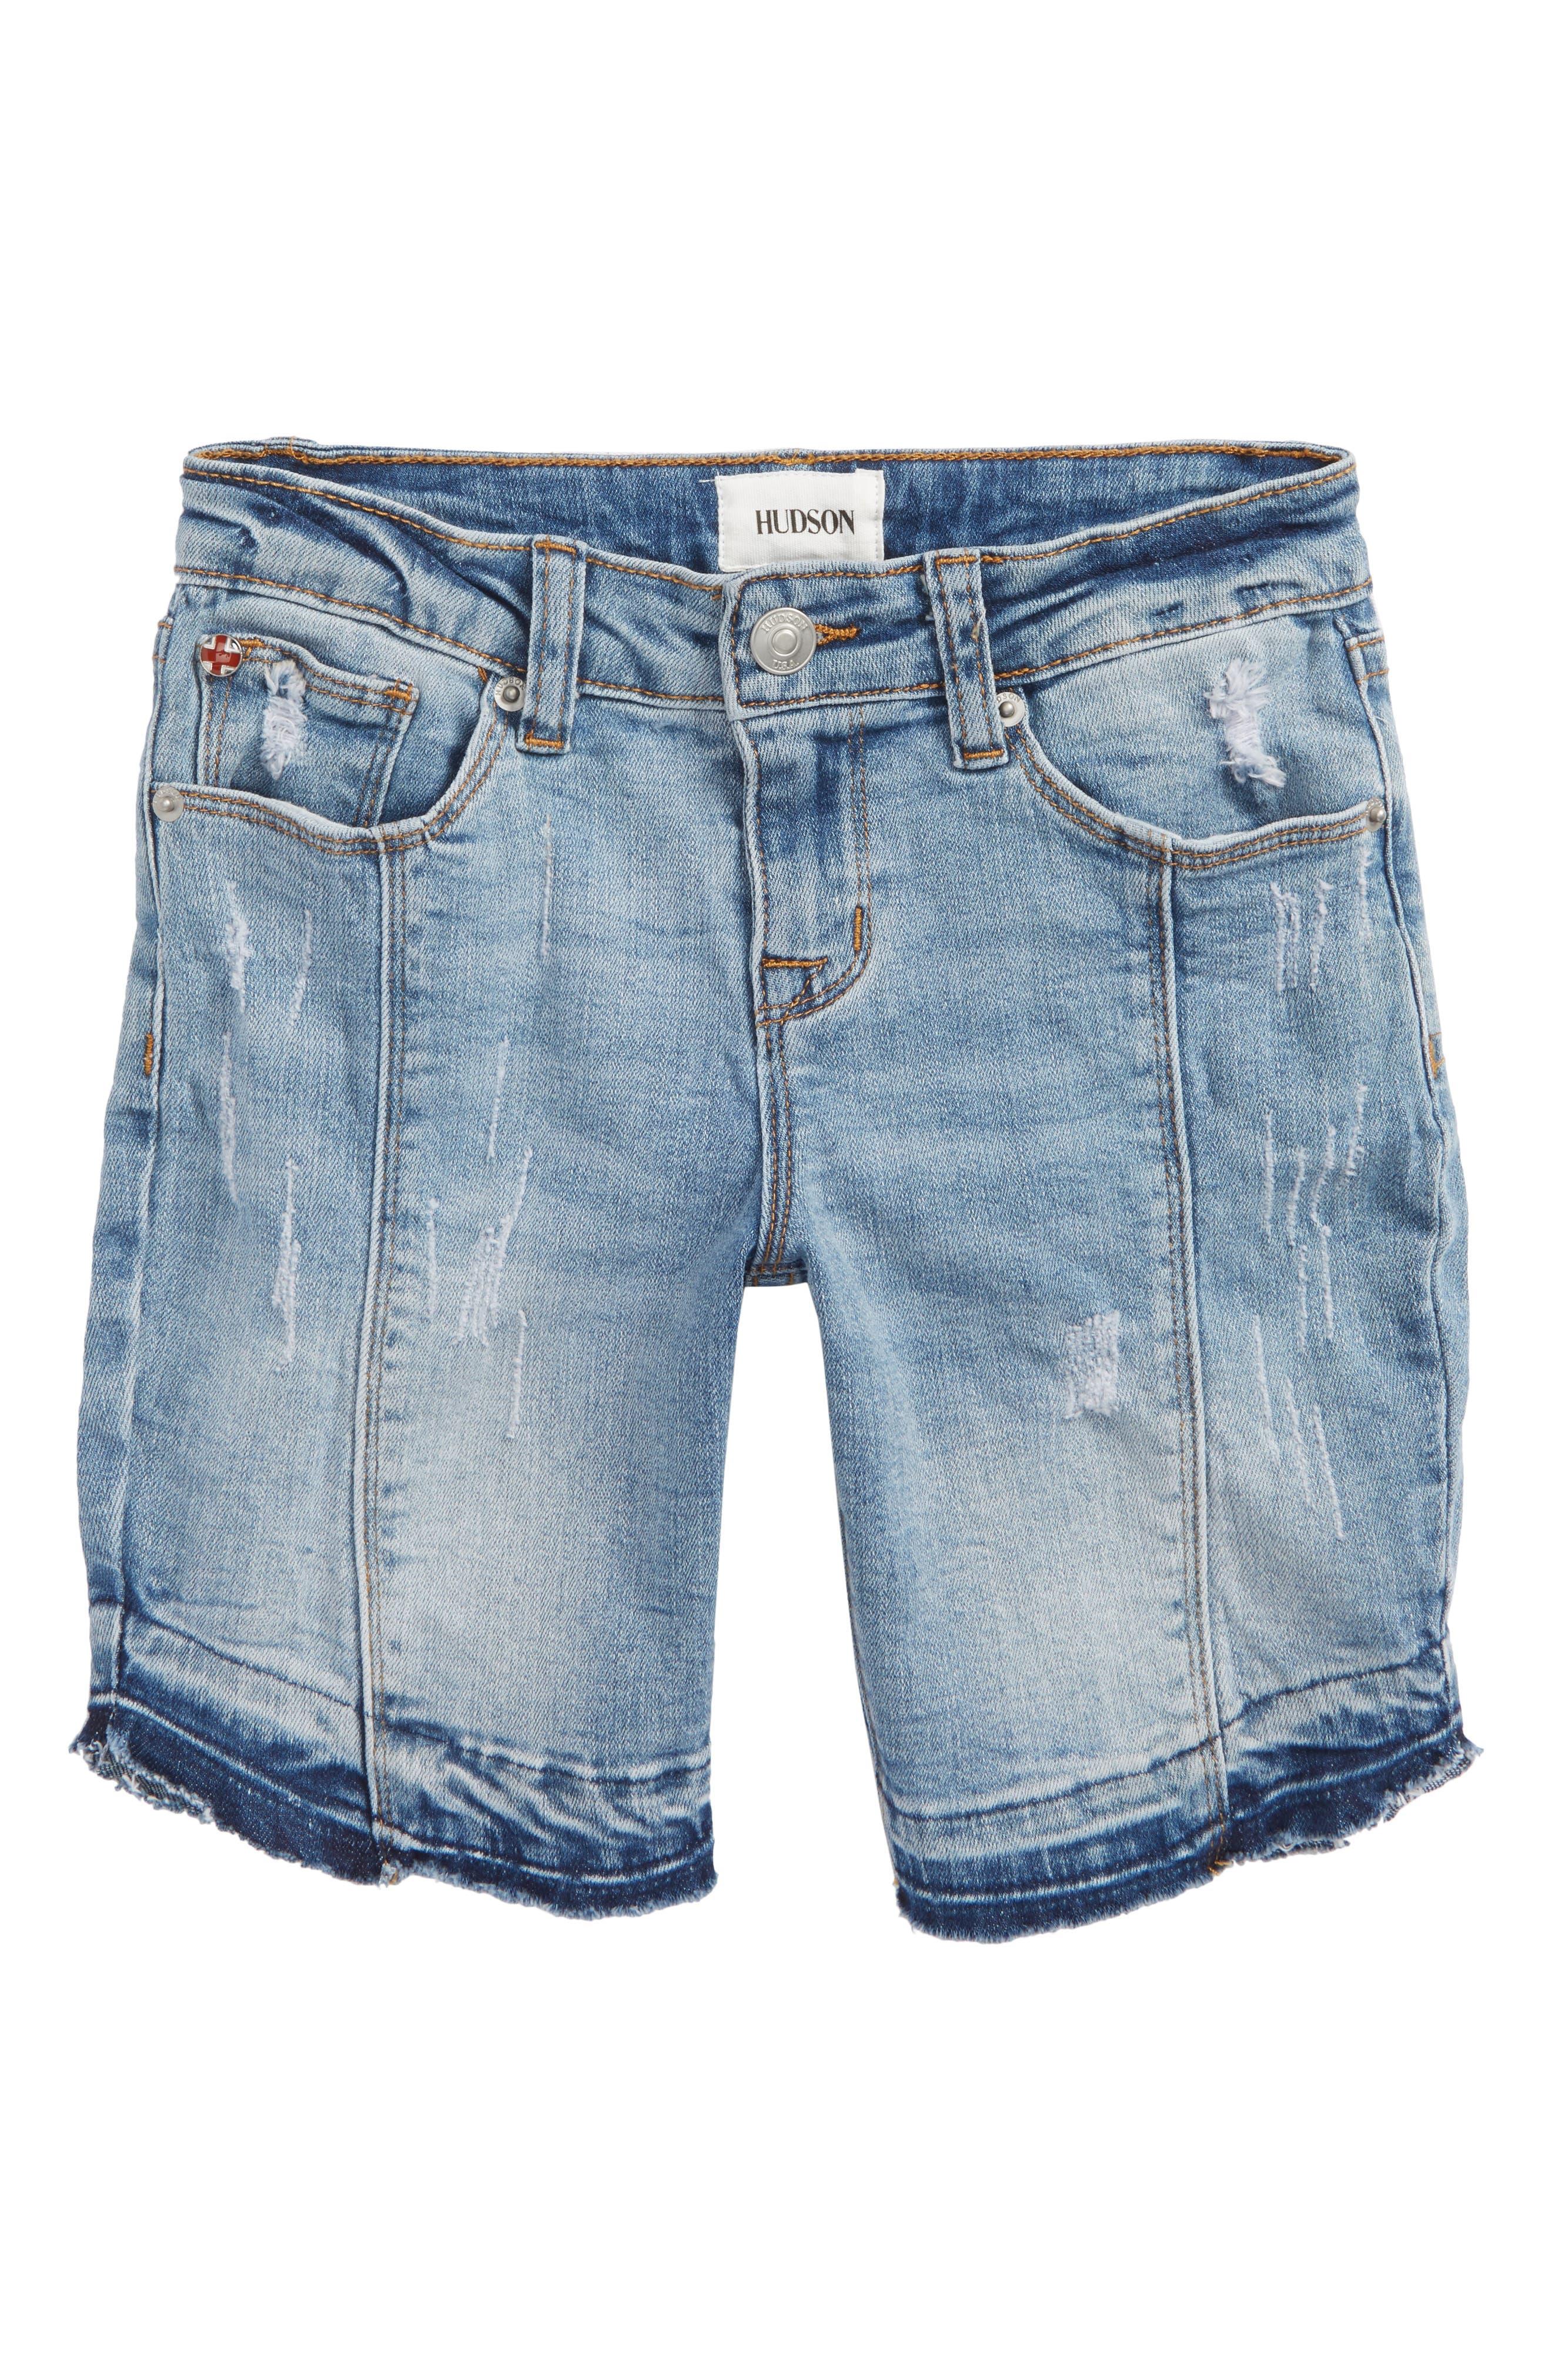 Release Hem Distressed Denim Shorts,                         Main,                         color, Cali Blue